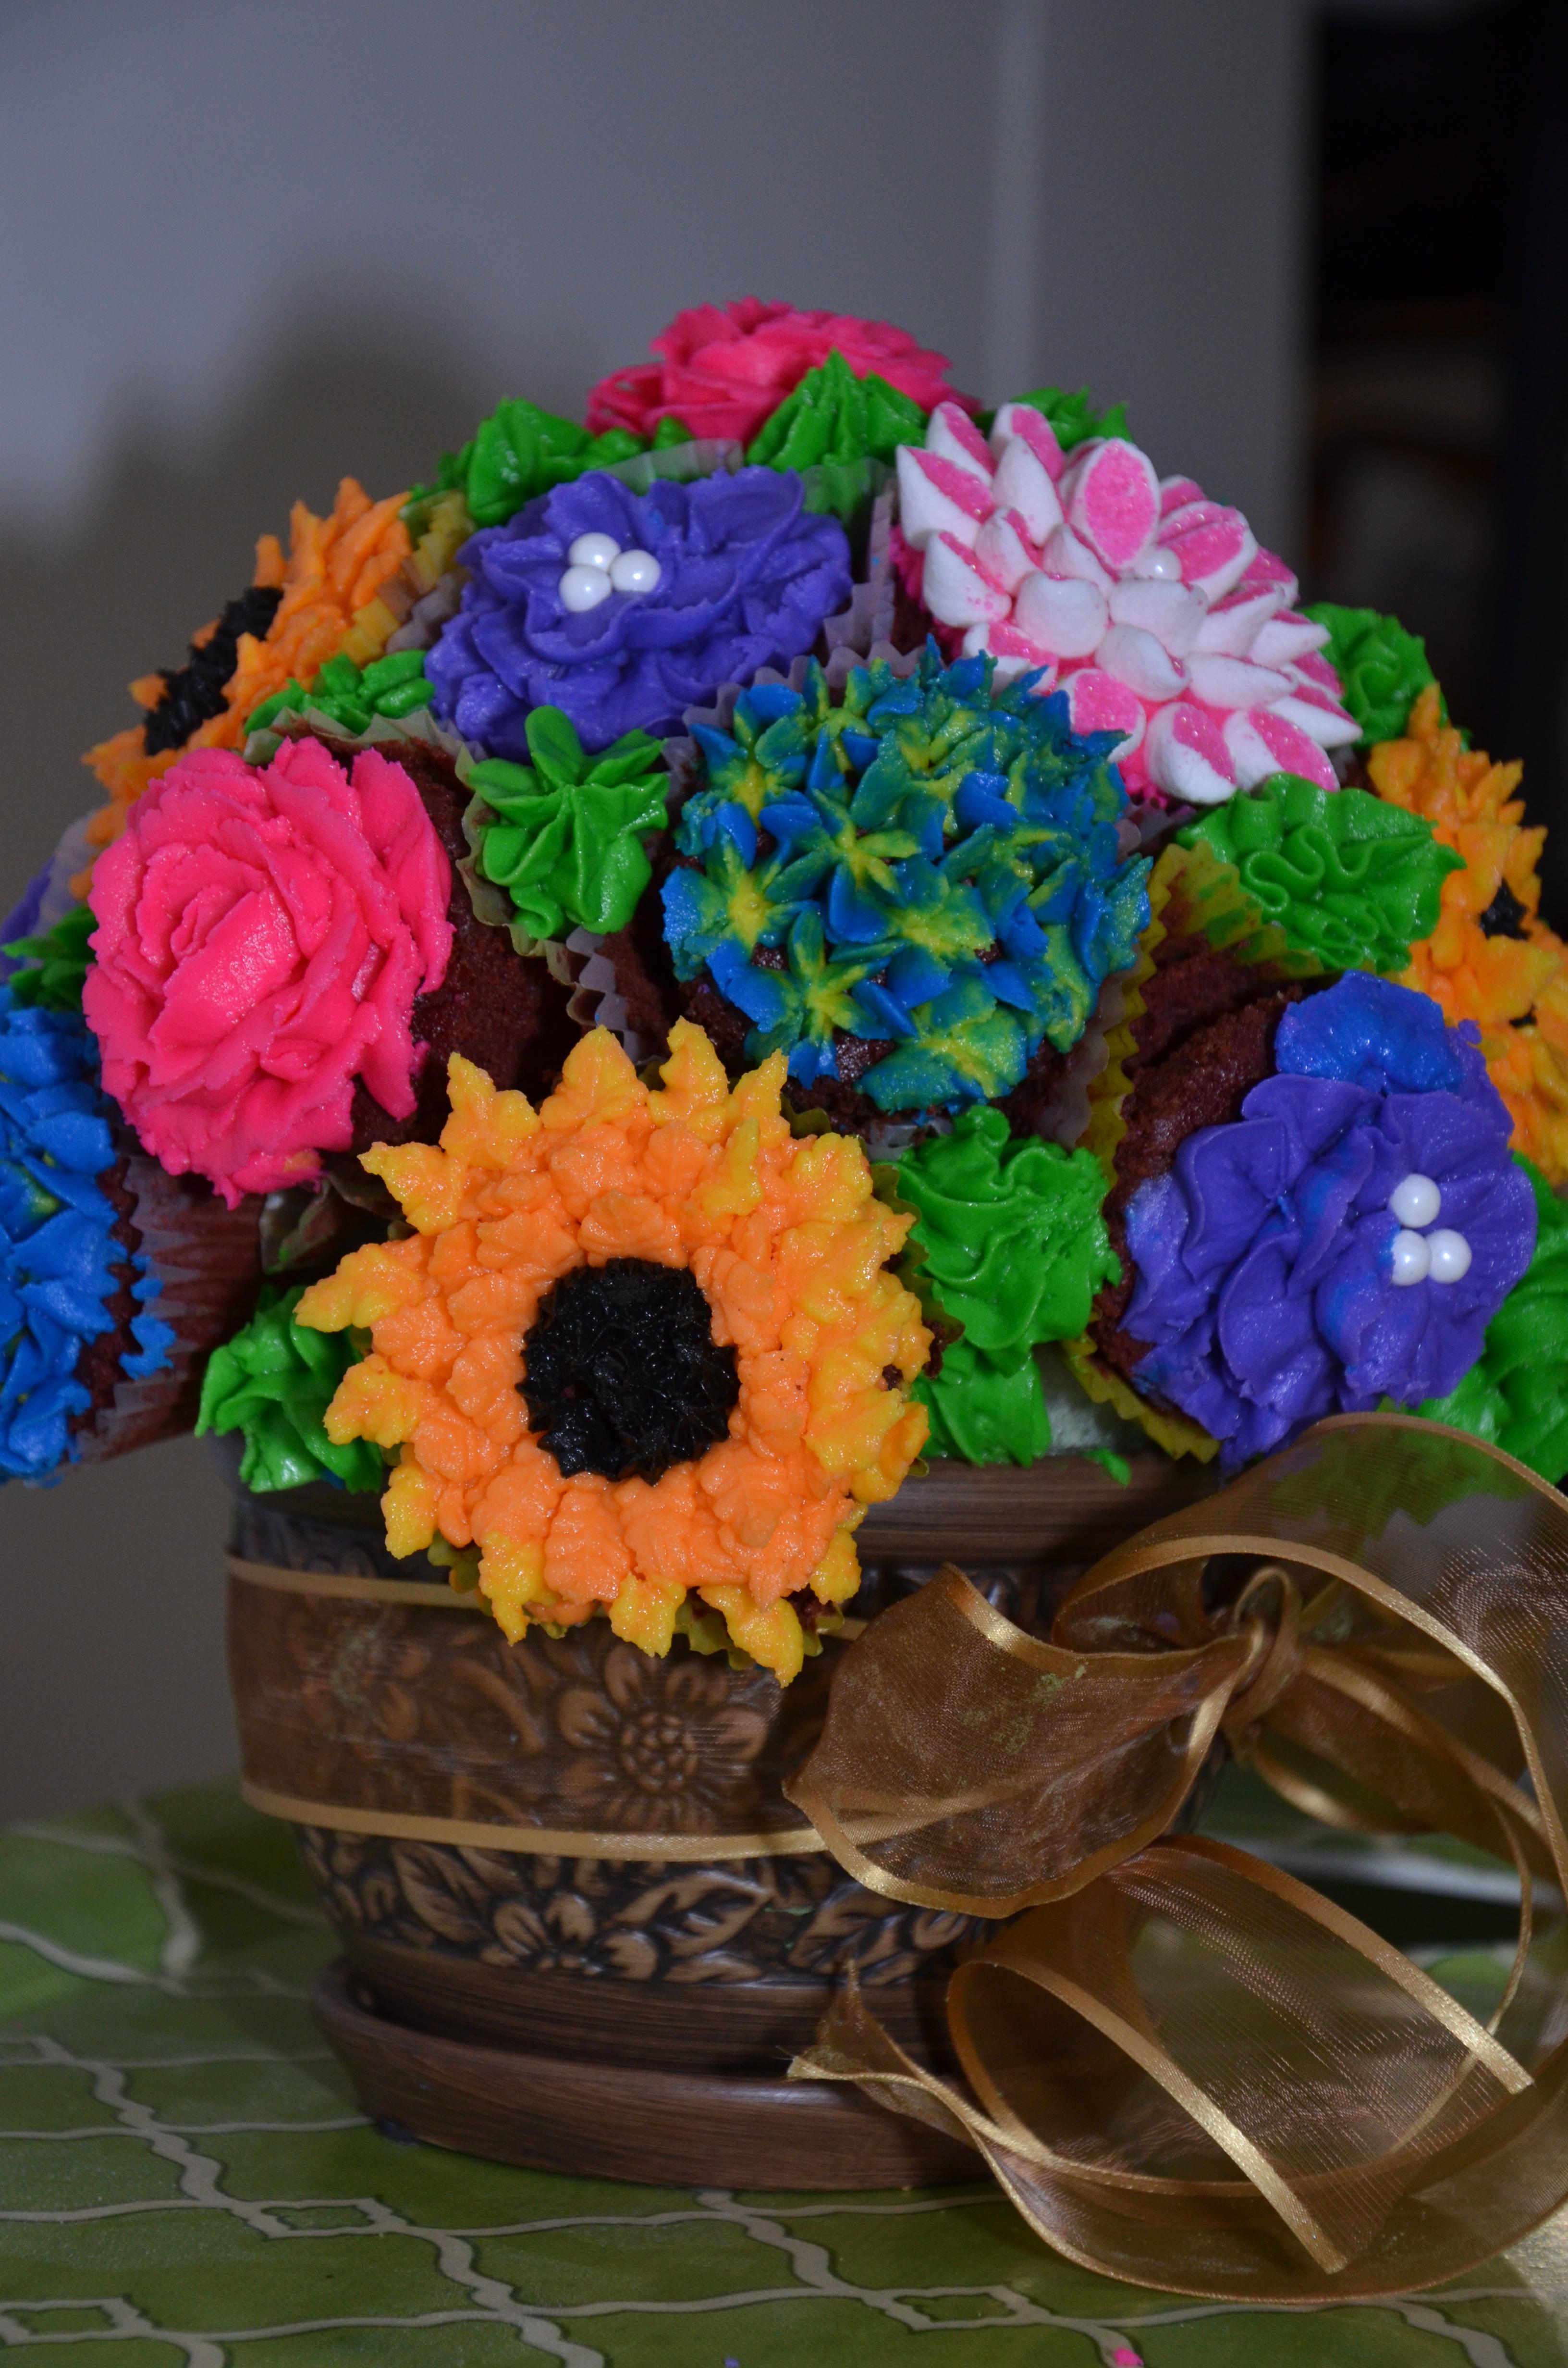 Gluten free cupcake bouquets by grace cakes dsc2020 izmirmasajfo